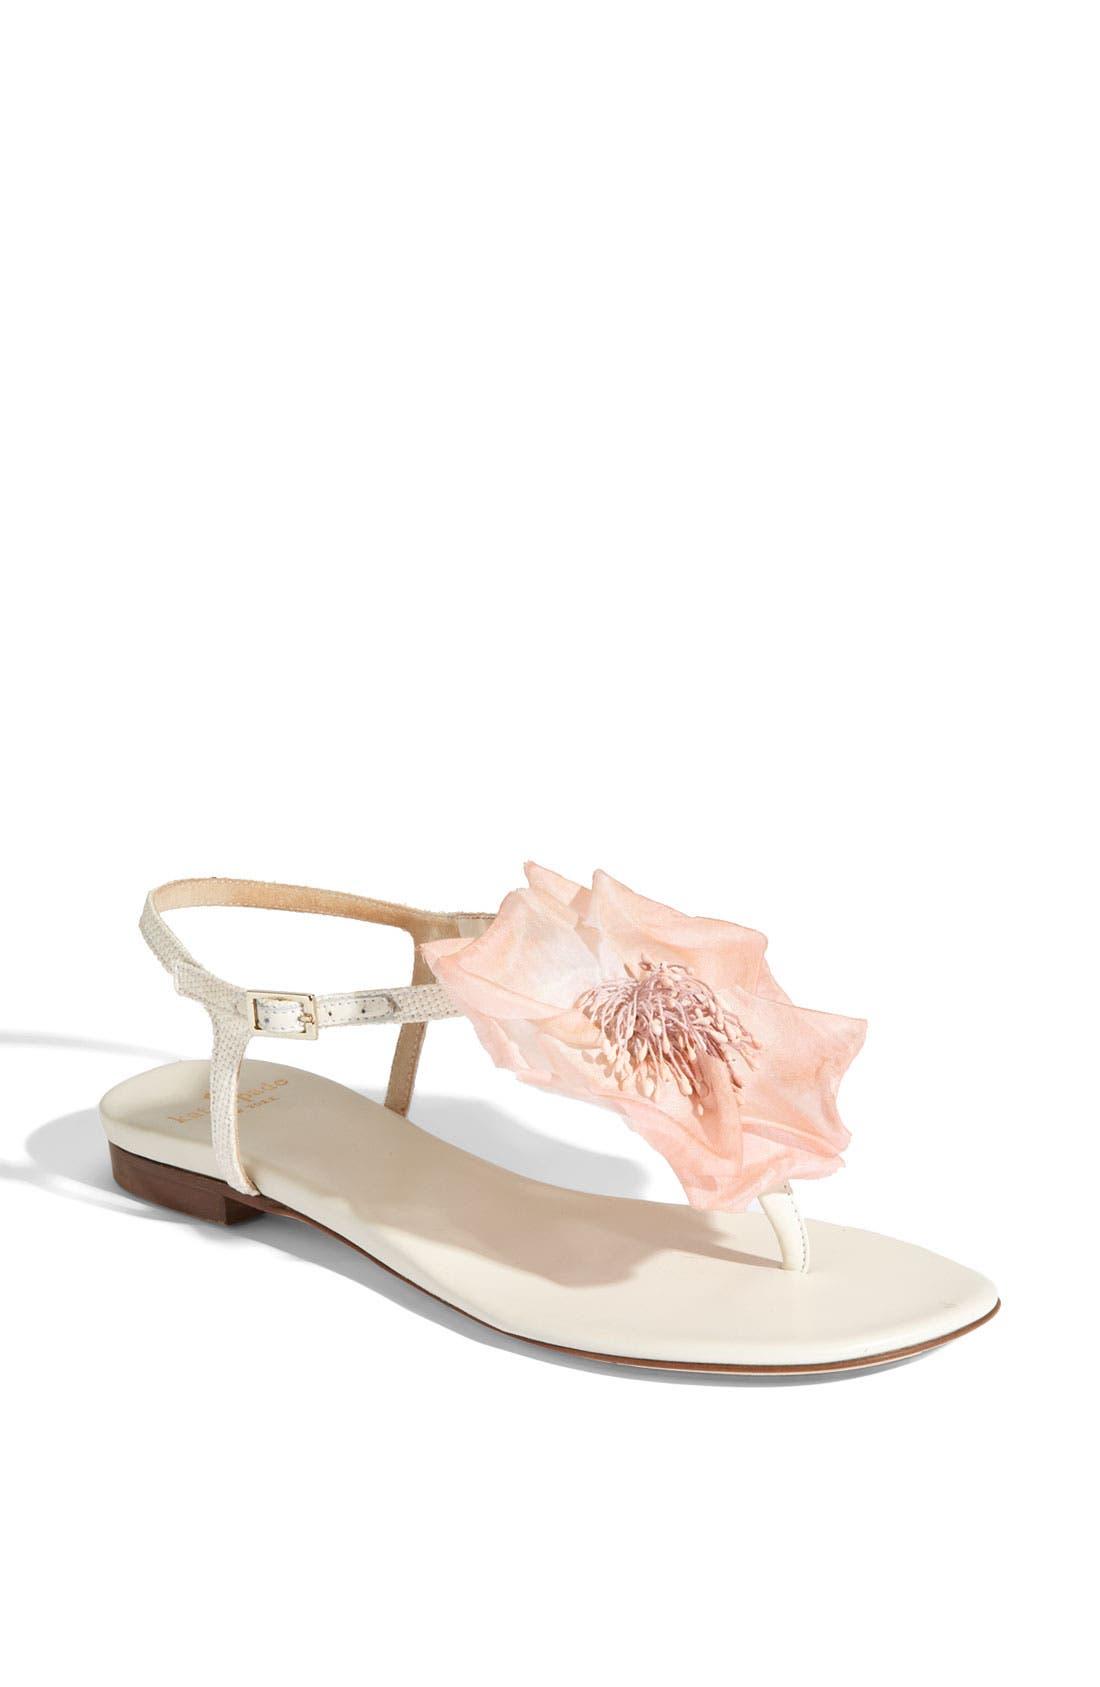 Main Image - kate spade new york 'florina' sandal